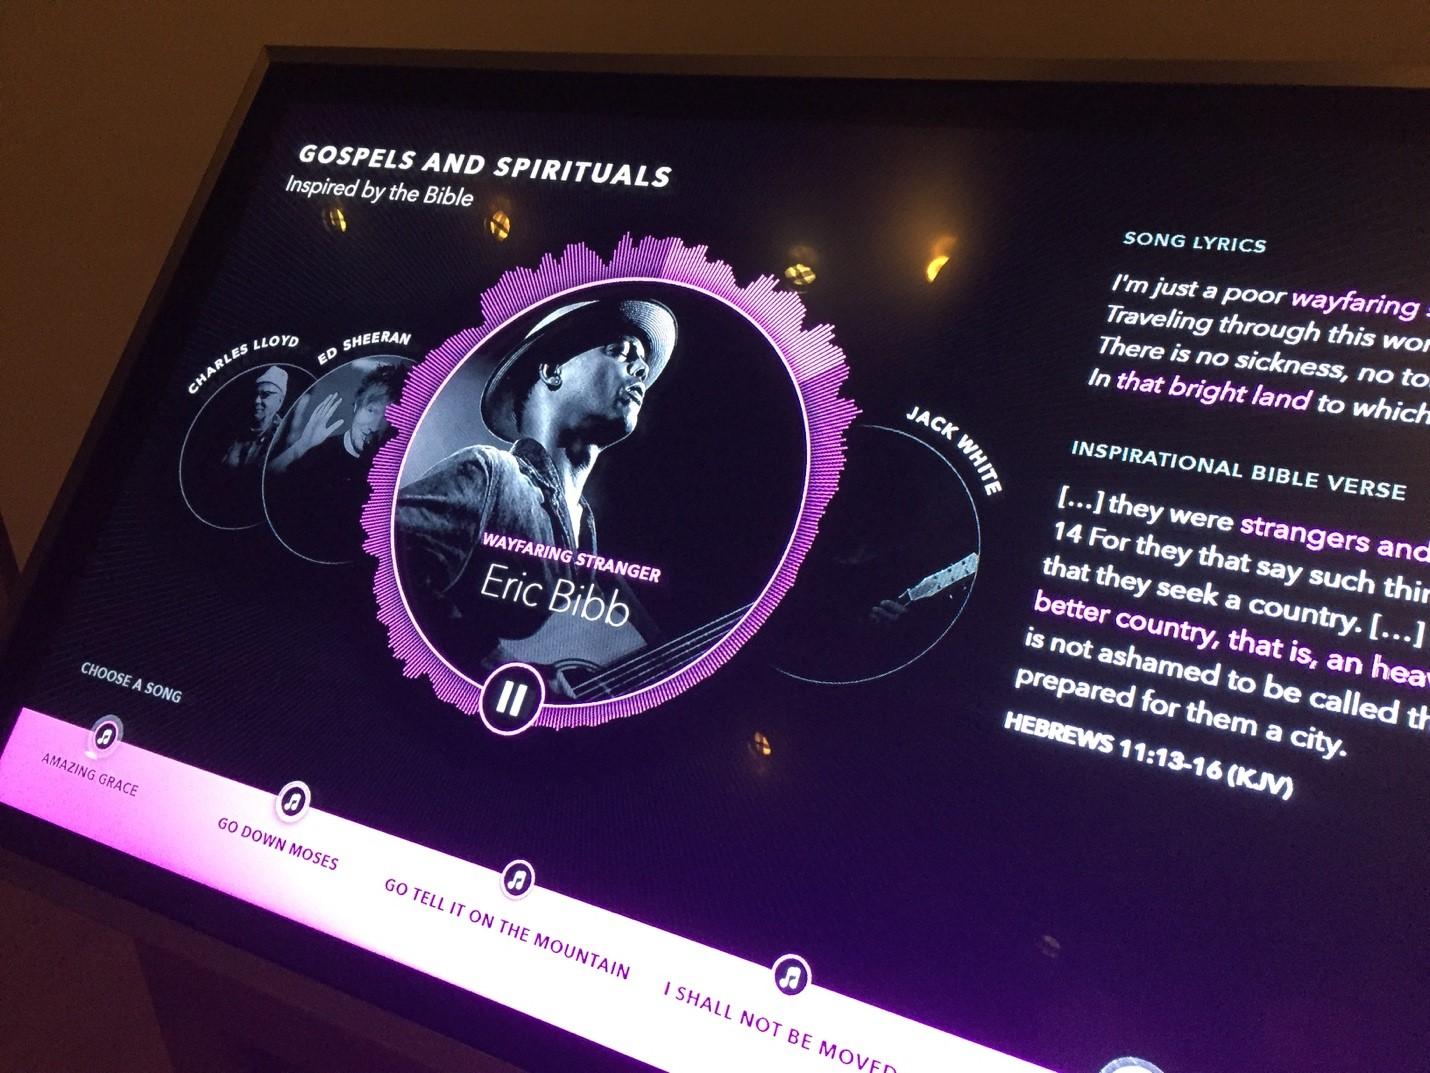 Spirituals, History, and Popular Artist Audio Interactive,  The Impact of the Bible   Photo Credit: Michaela Kizershot White